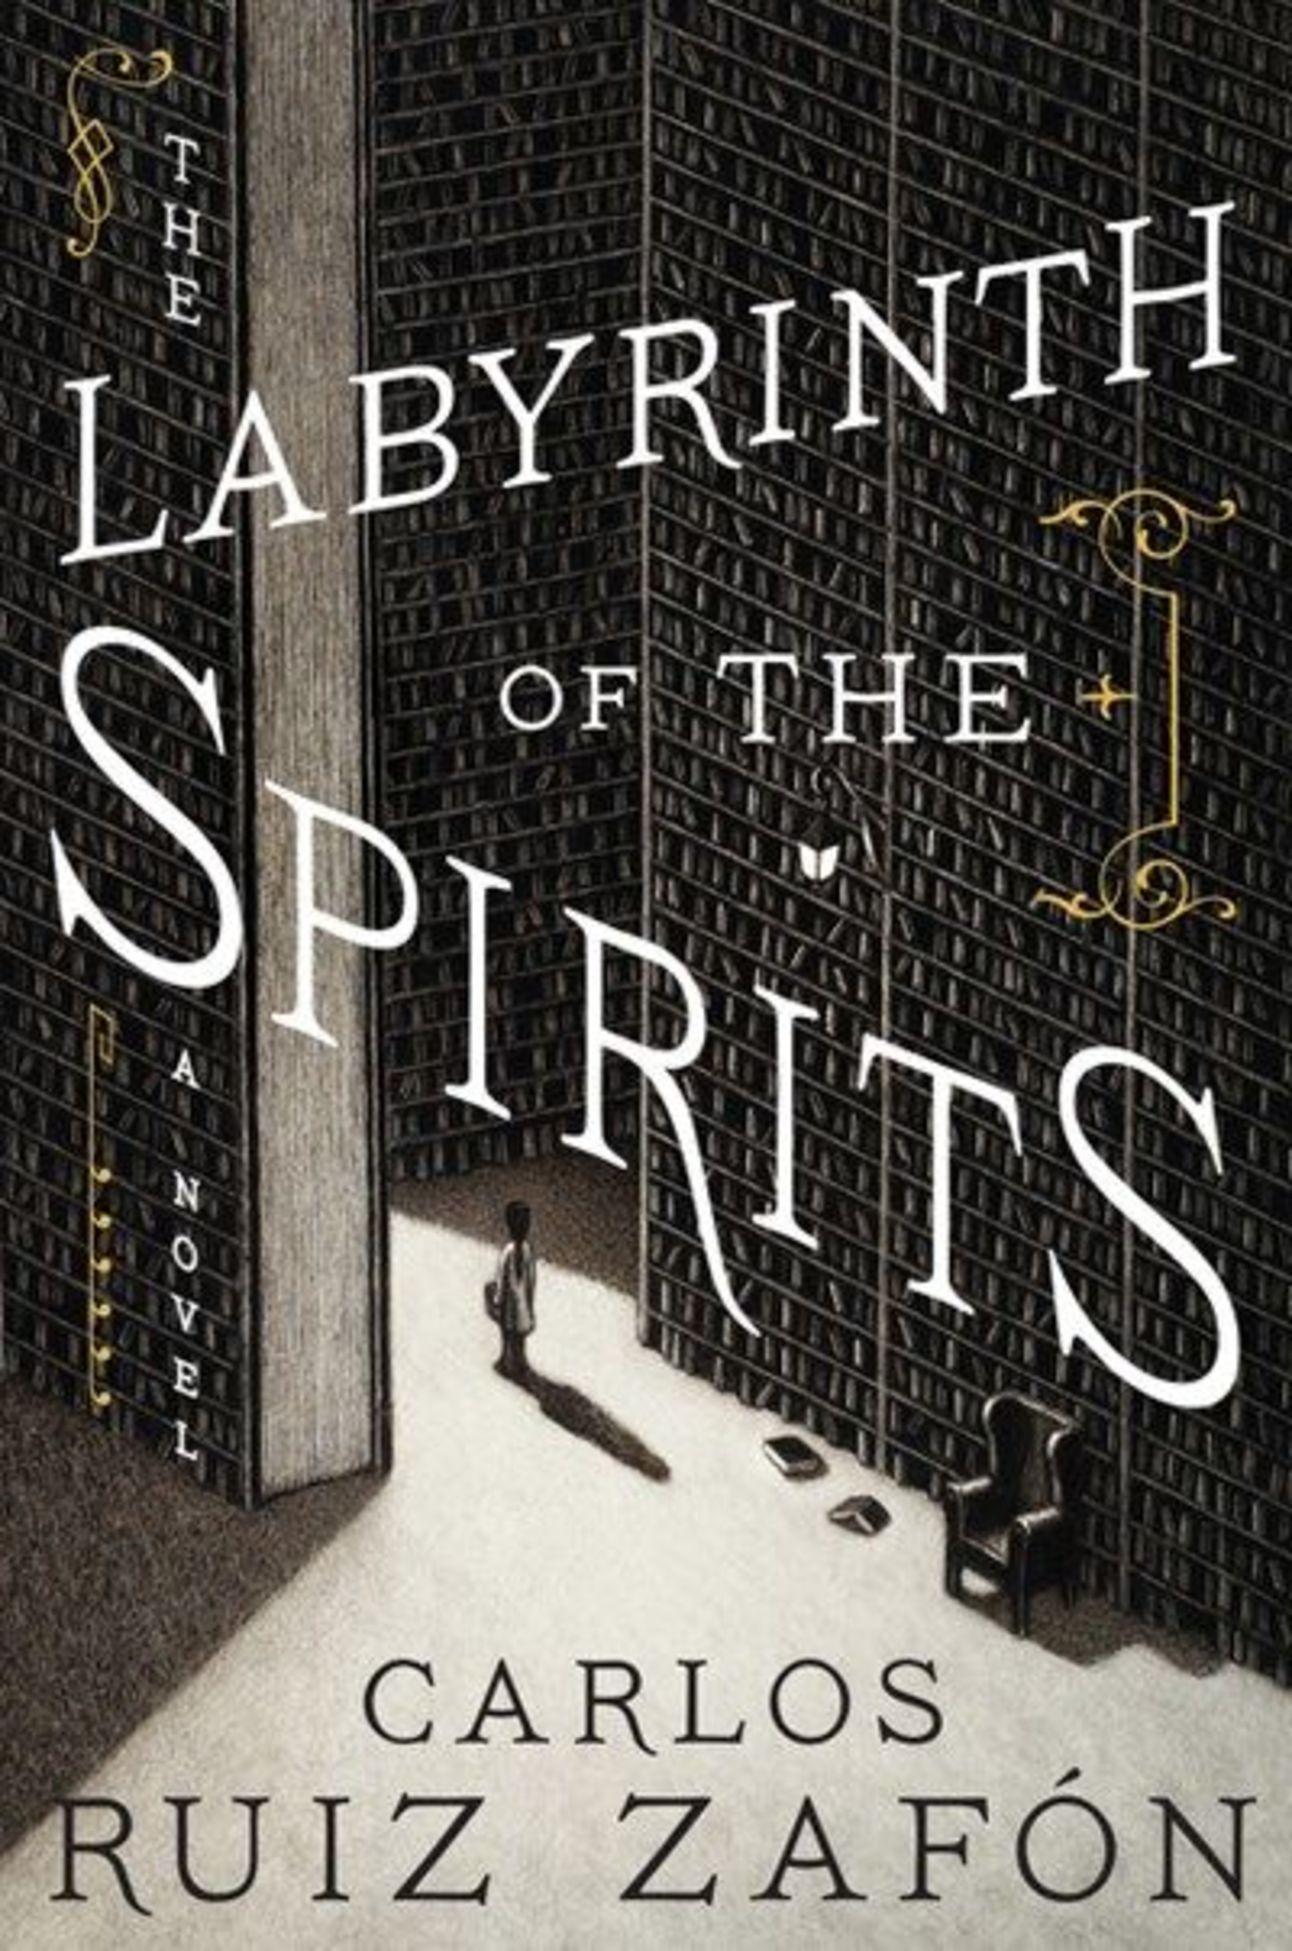 labyrinth-spirits